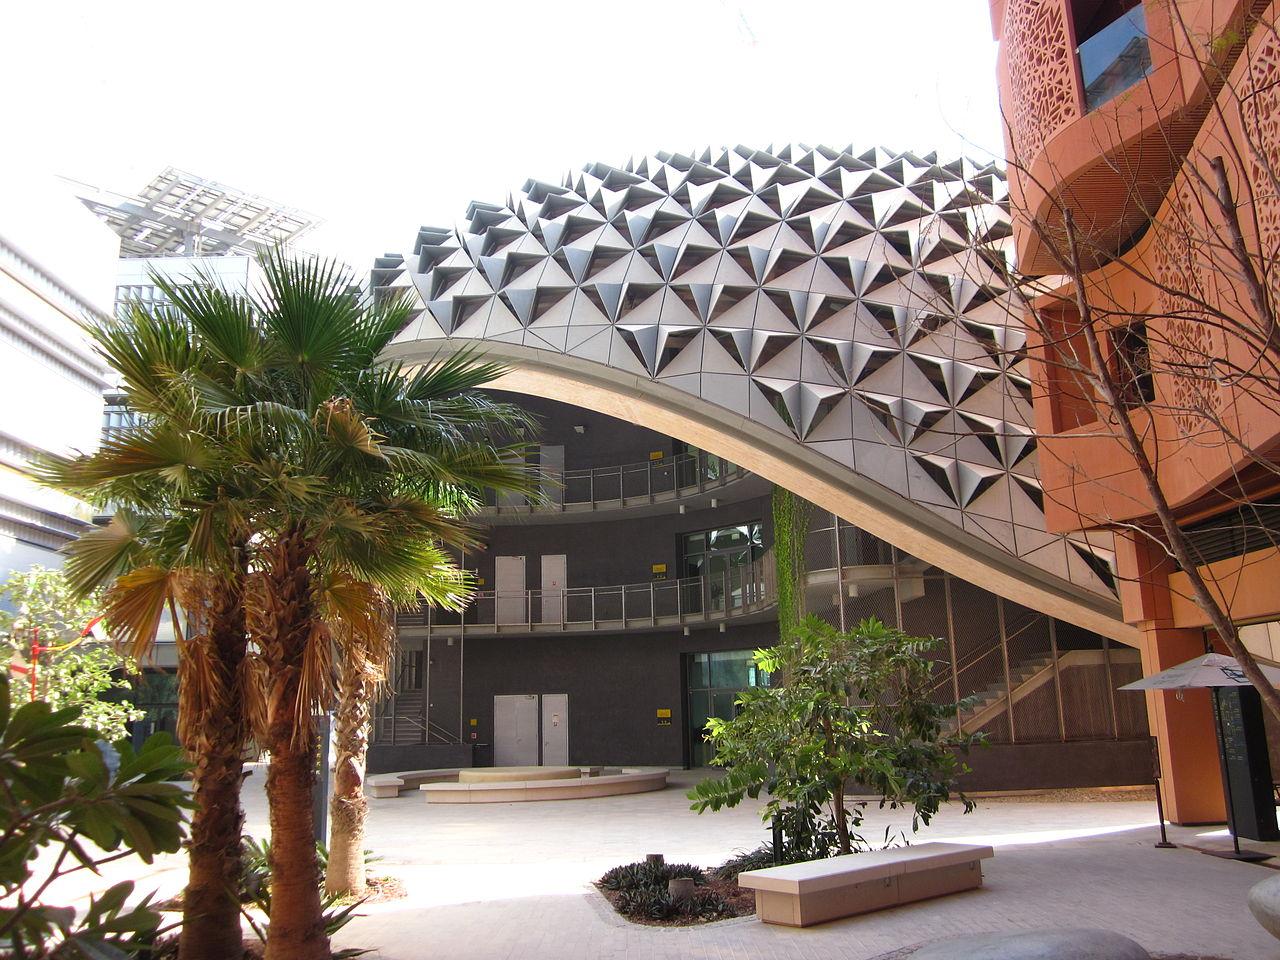 1280px-Masdar_city_(4)